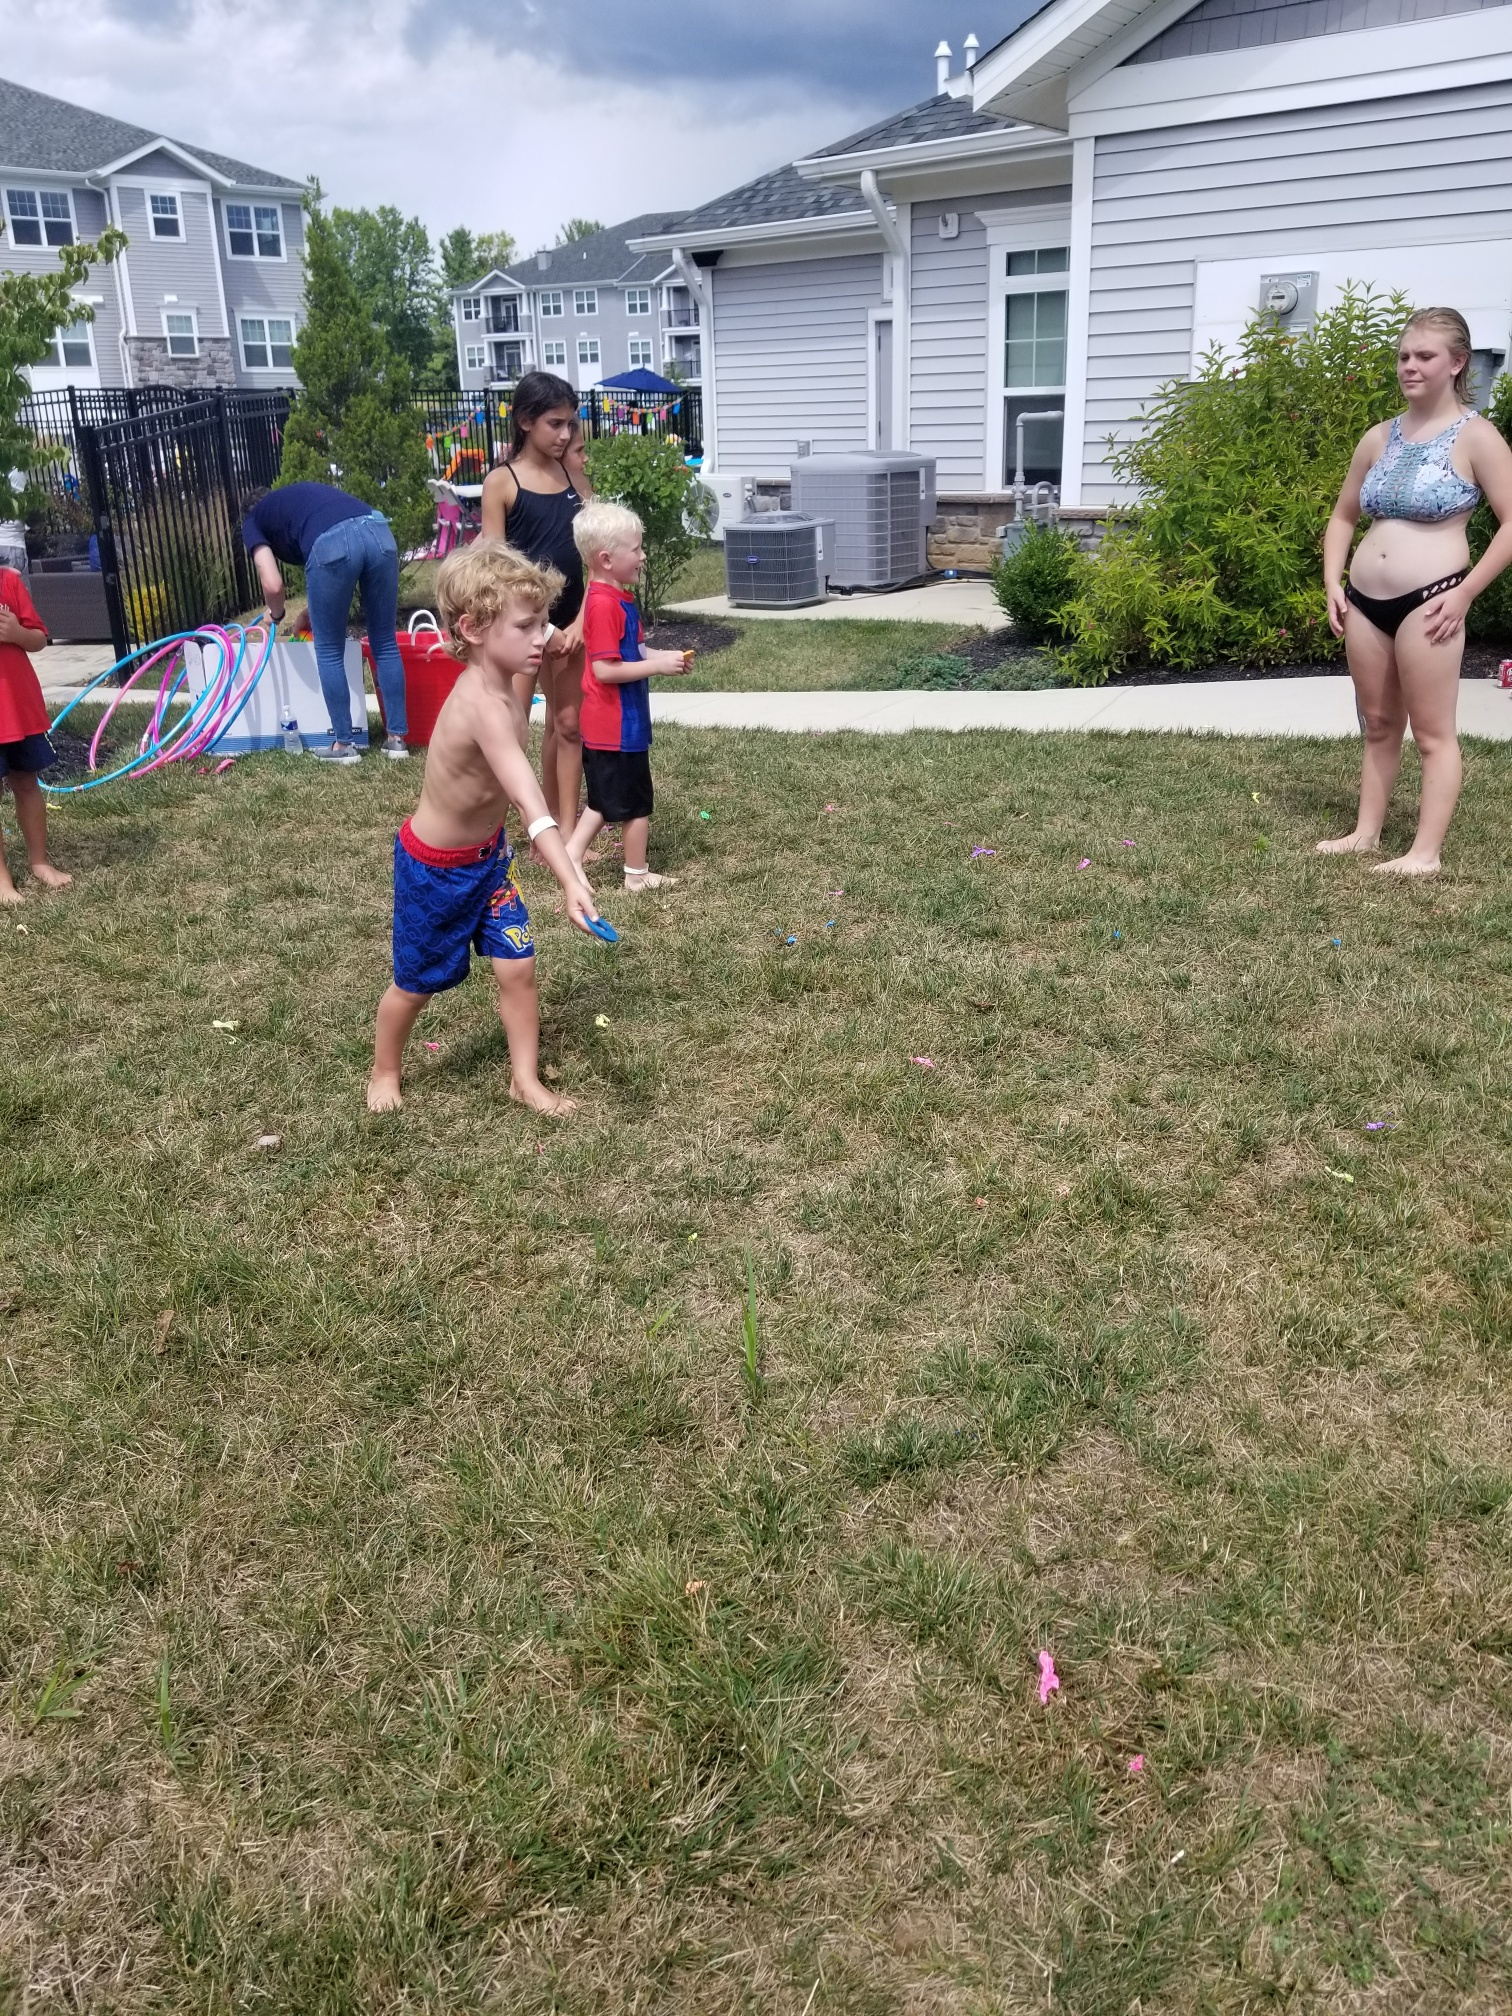 2019 Avanti Apartments Pool Party - Lawn Games